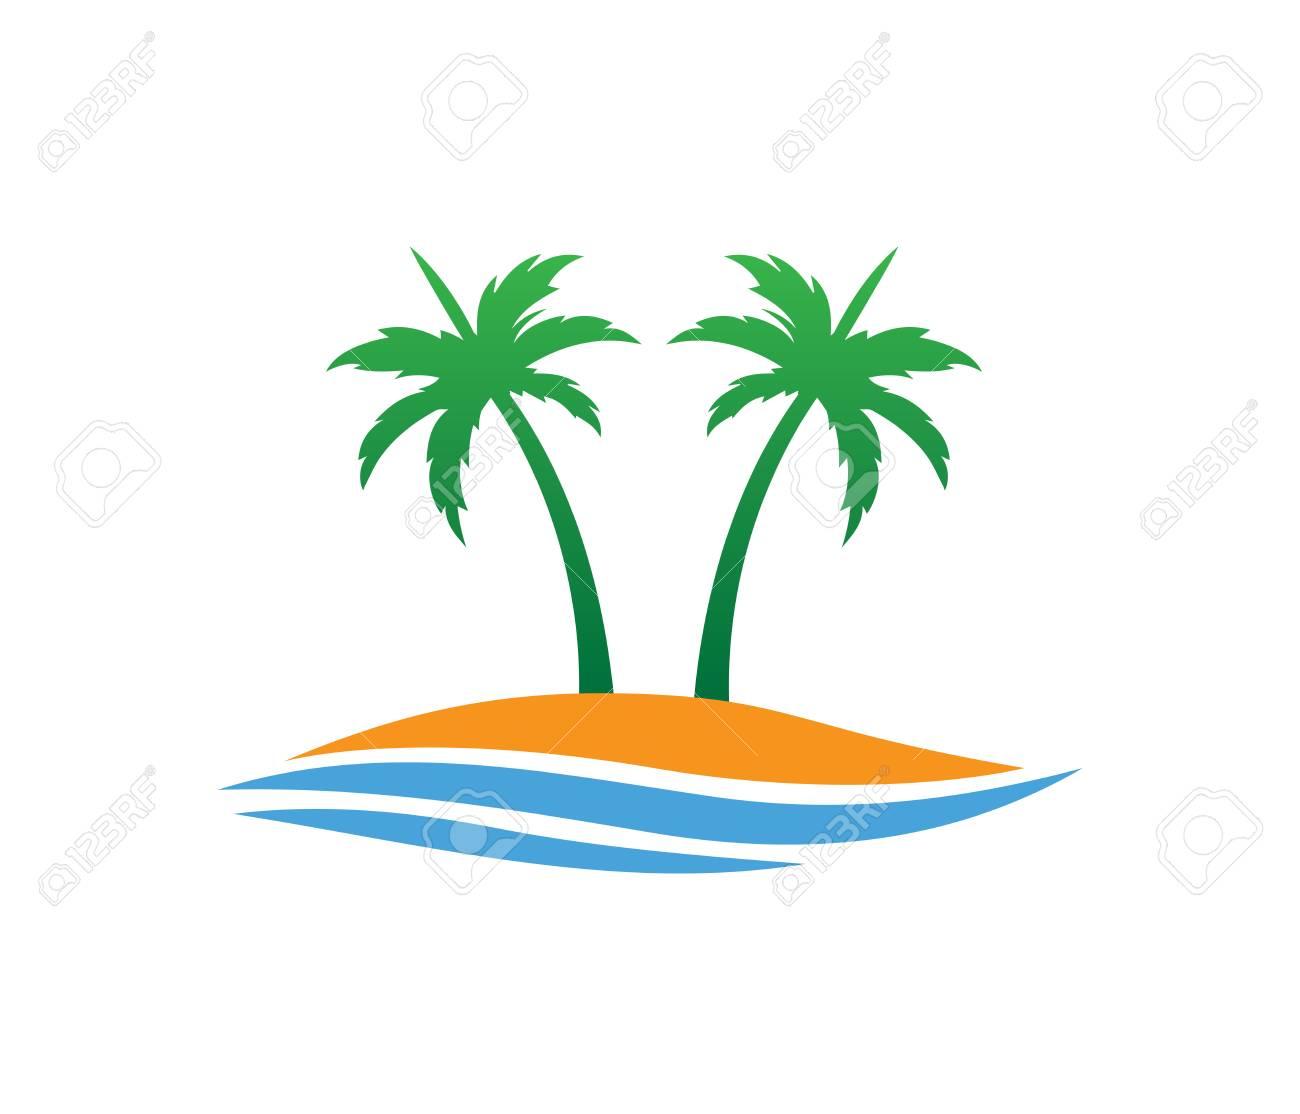 hotel tourism holiday summer beach coconut palm tree vector logo rh 123rf com palm tree vector freepik free palm tree vector art